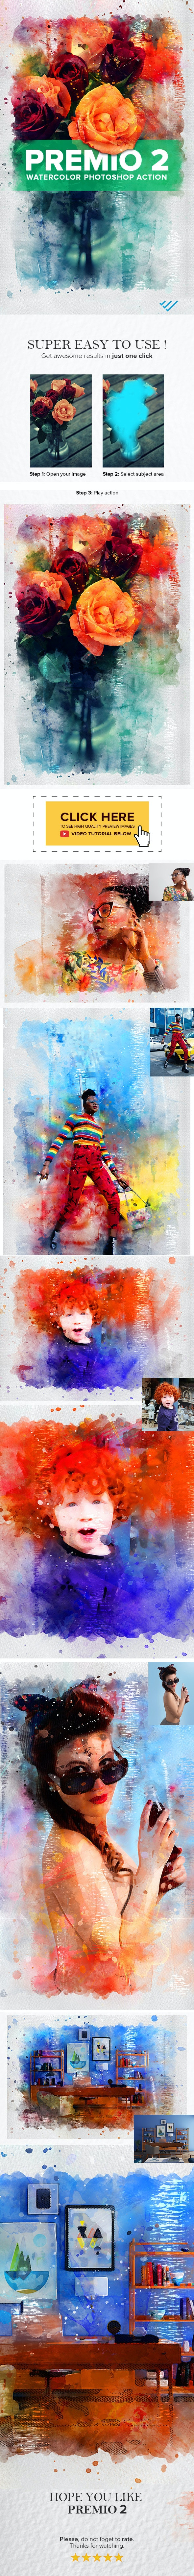 Premio 2 Watercolor Photoshop Action - Actions Photoshop